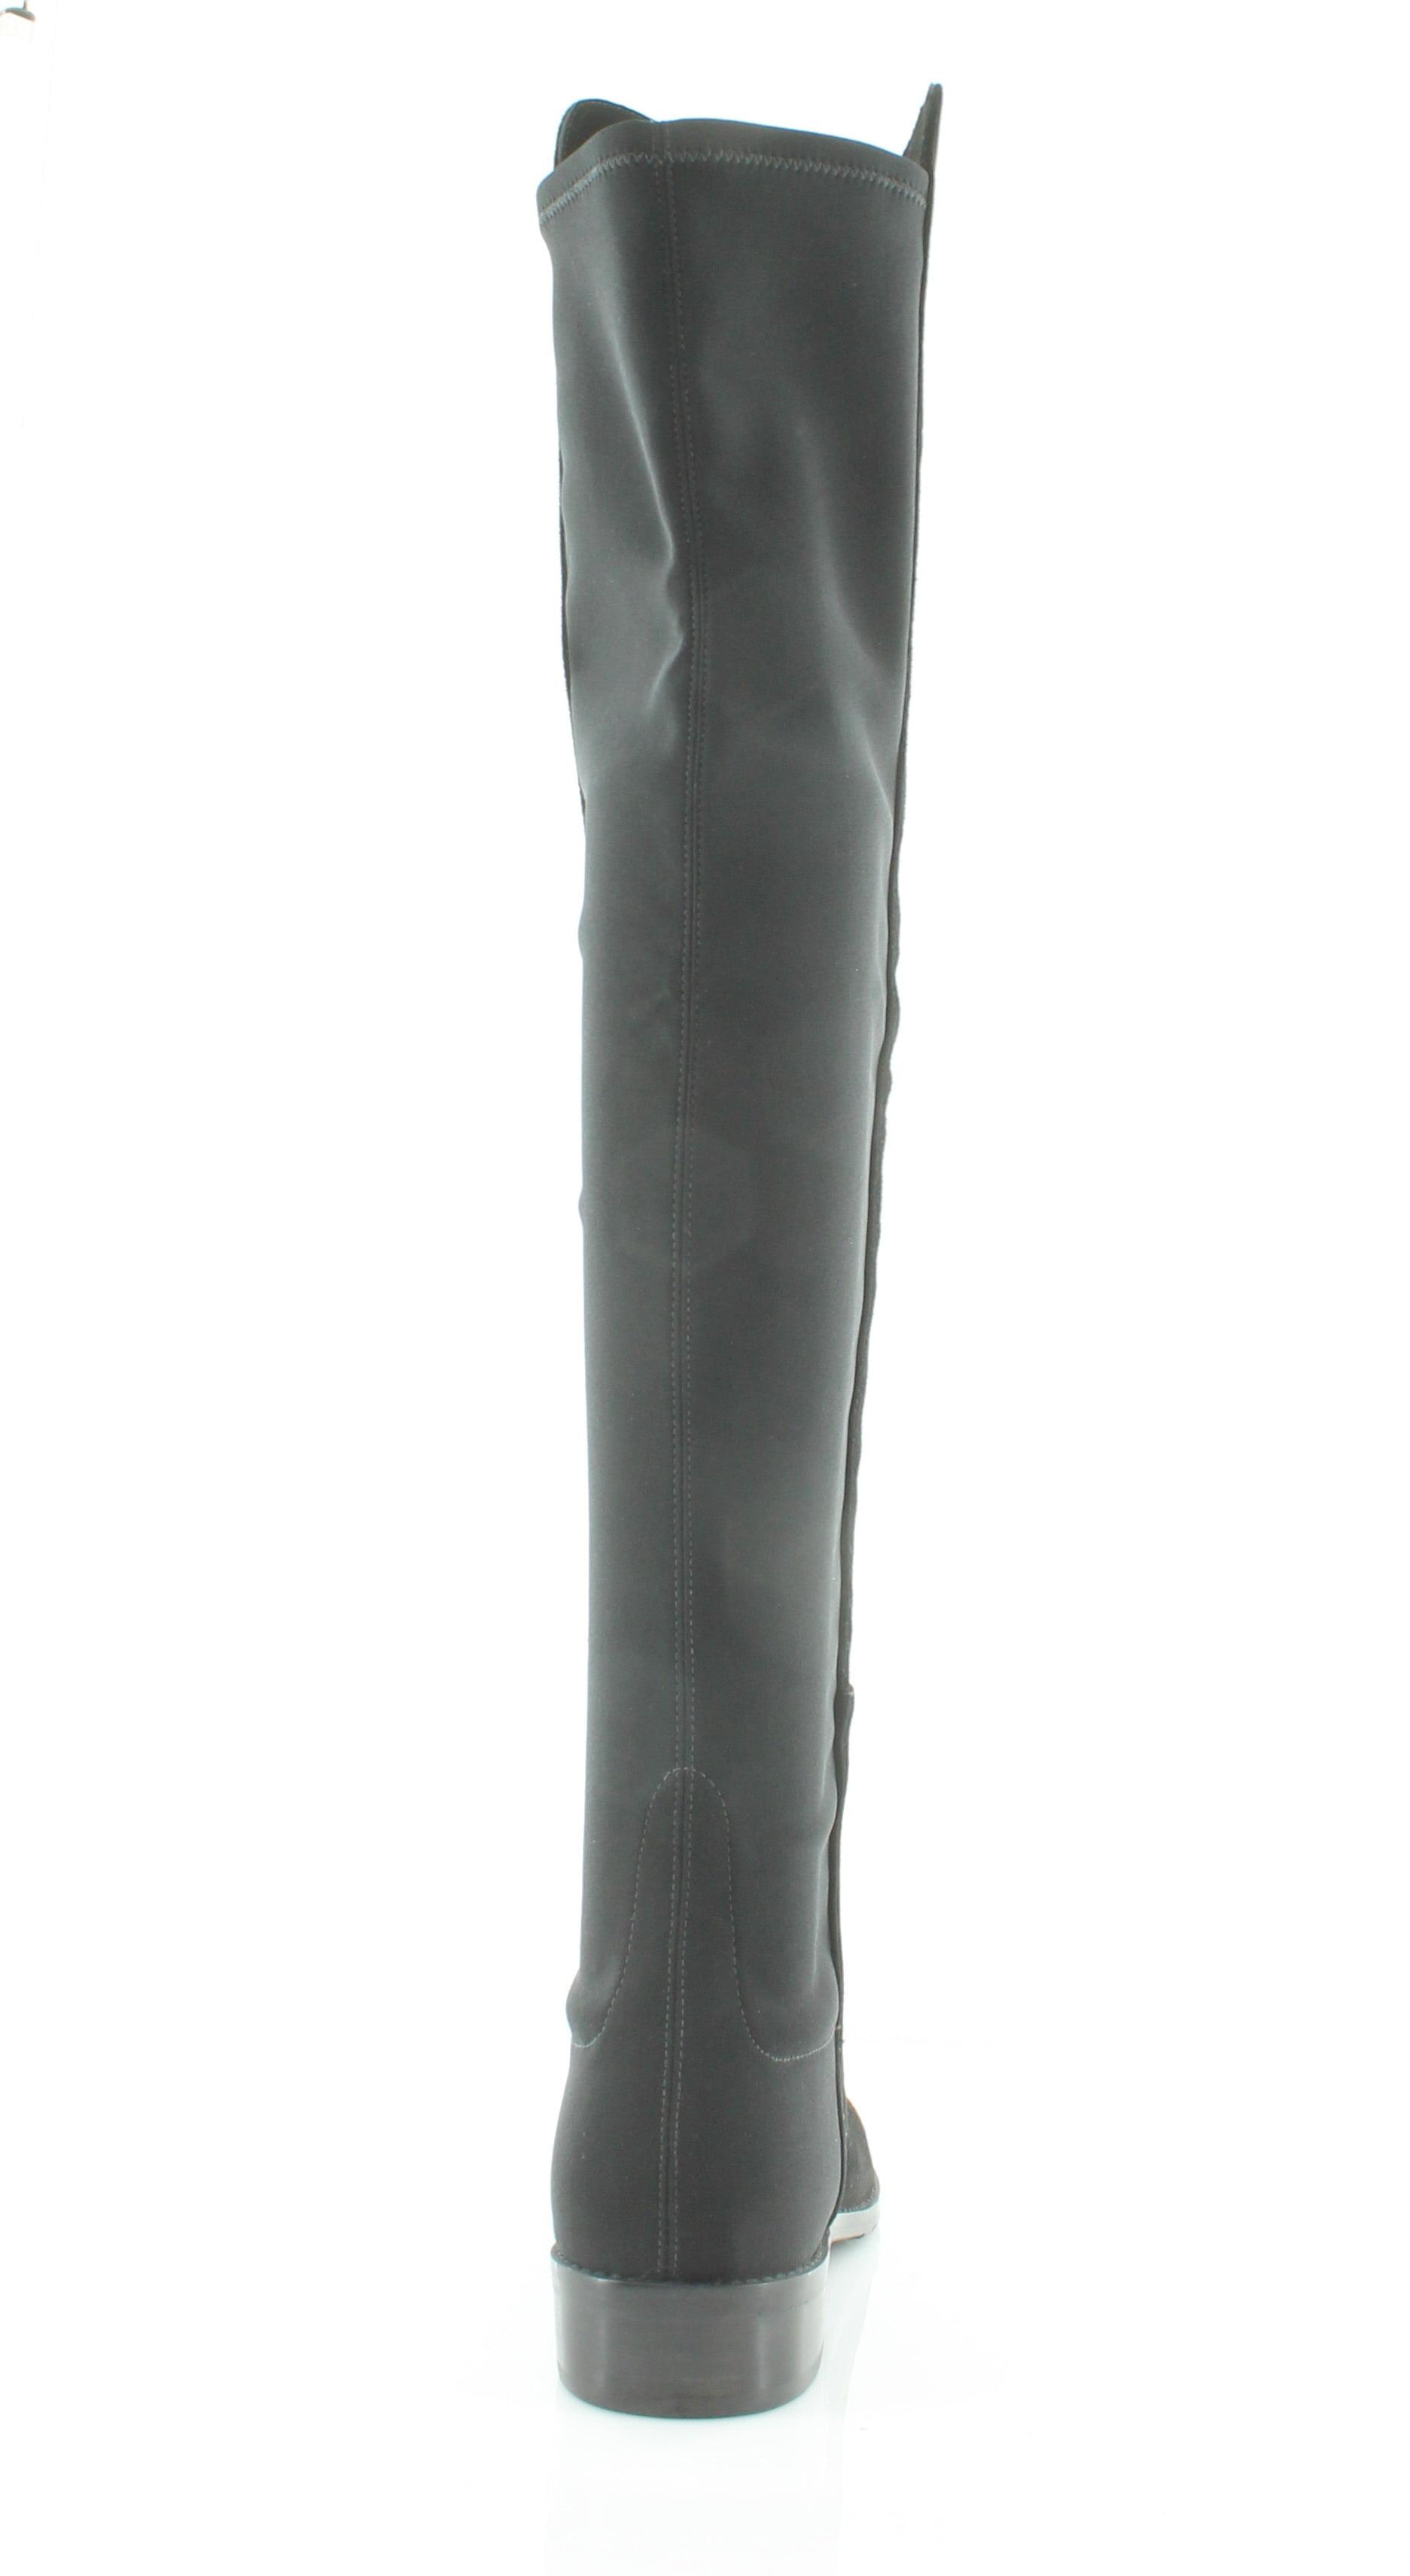 Stuart Weitzman 5400 Women's Boots Black Size 9 M